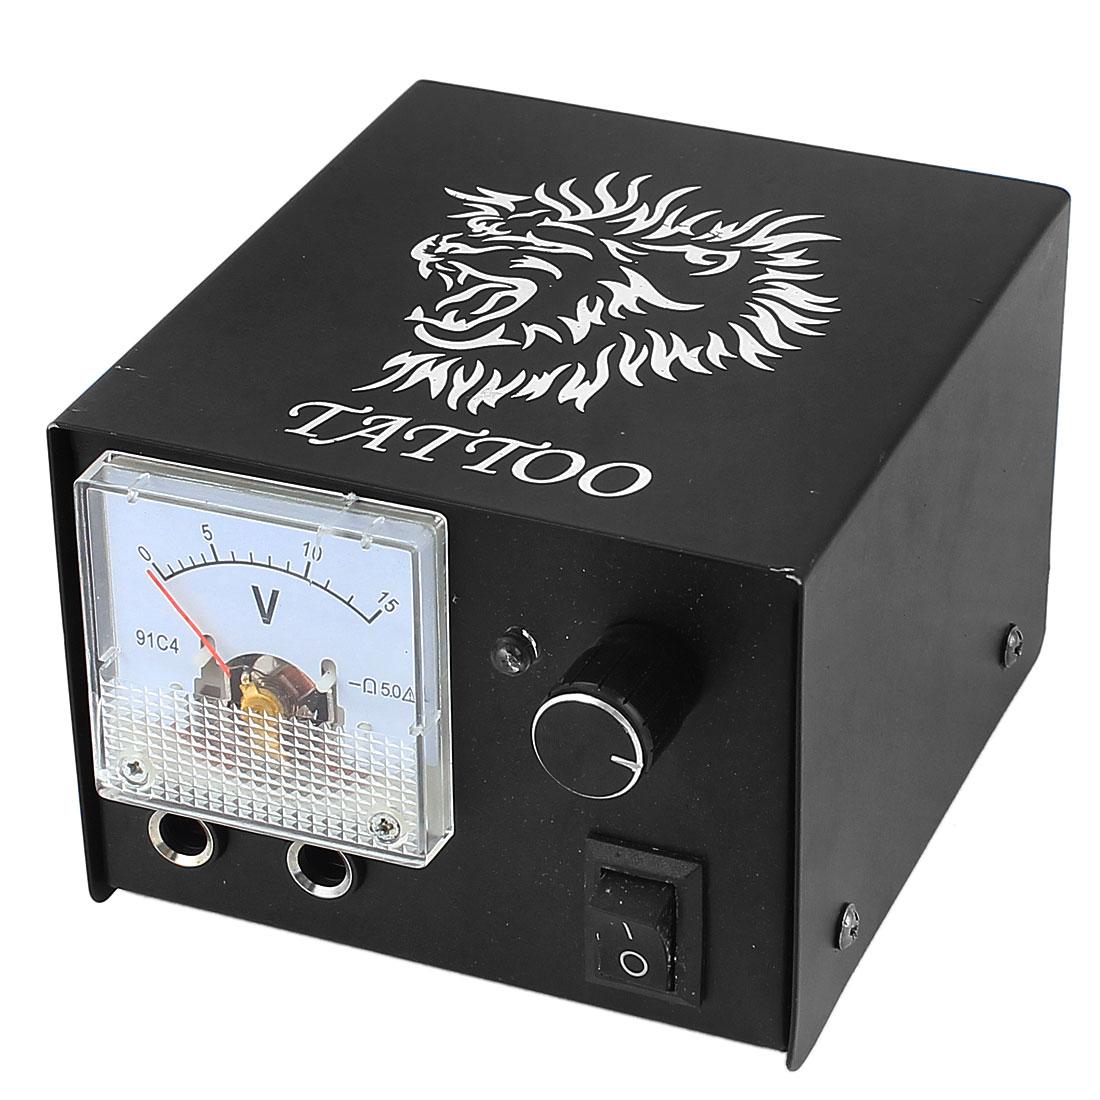 AU Plug AC 60-250V 10A Tattoo Machine Power Supply Kit w 1.5M Length Cord